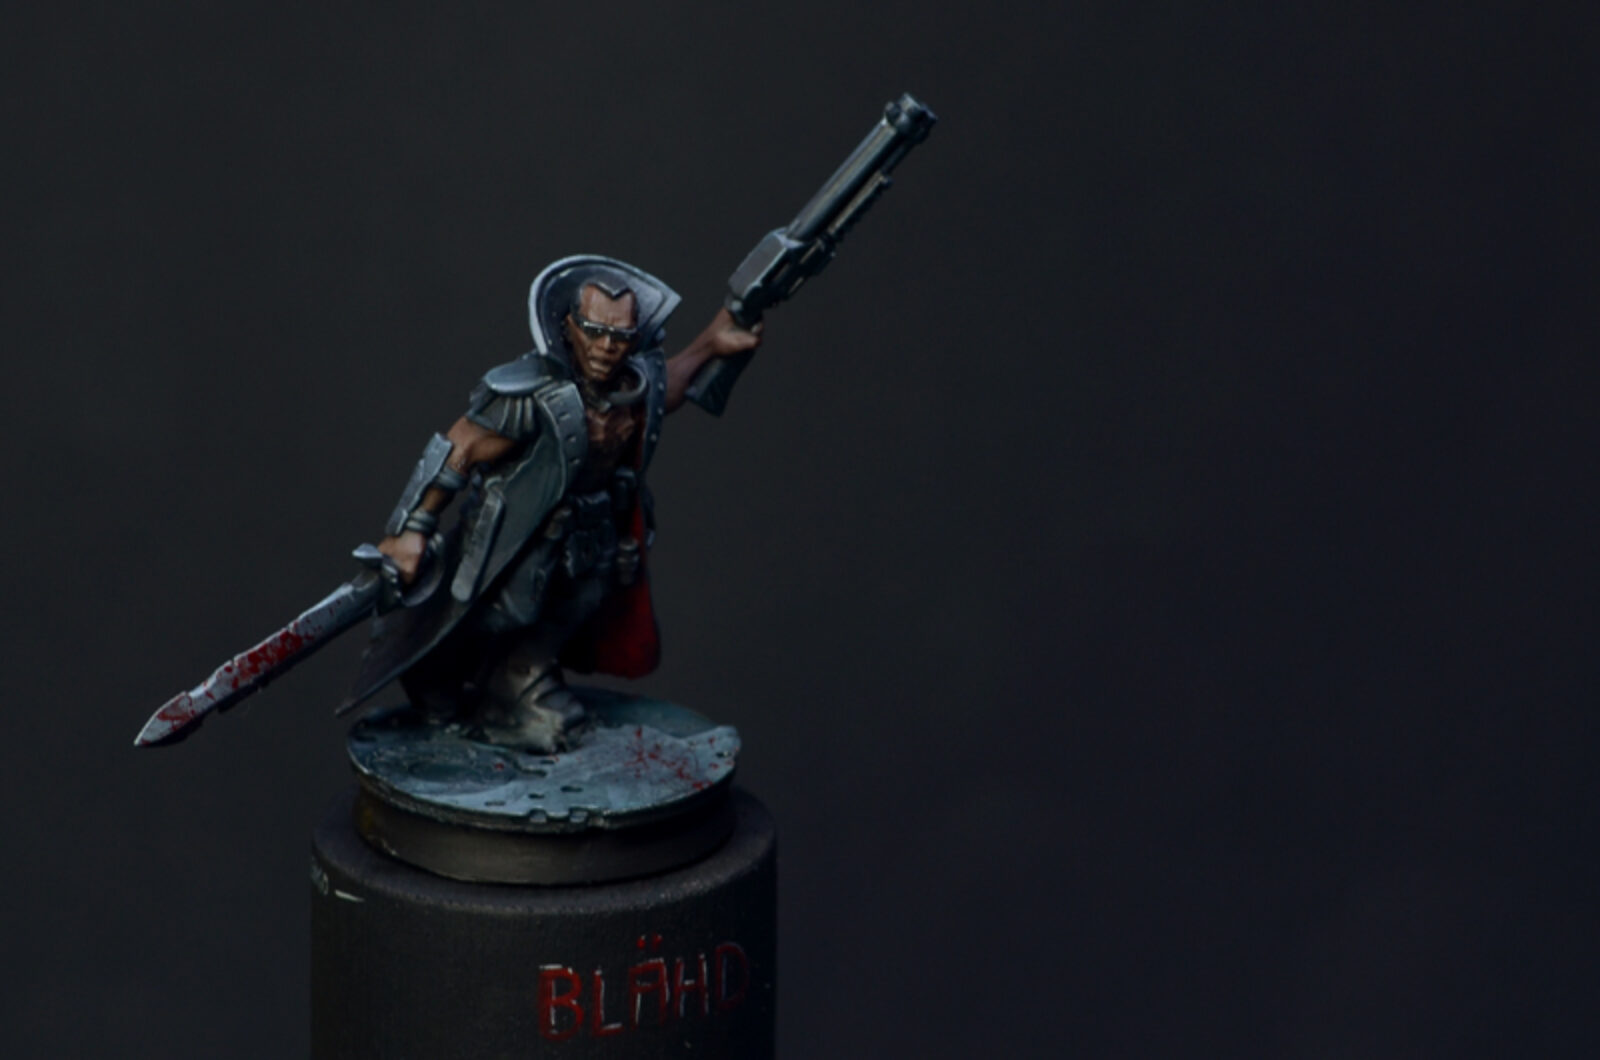 Blade04